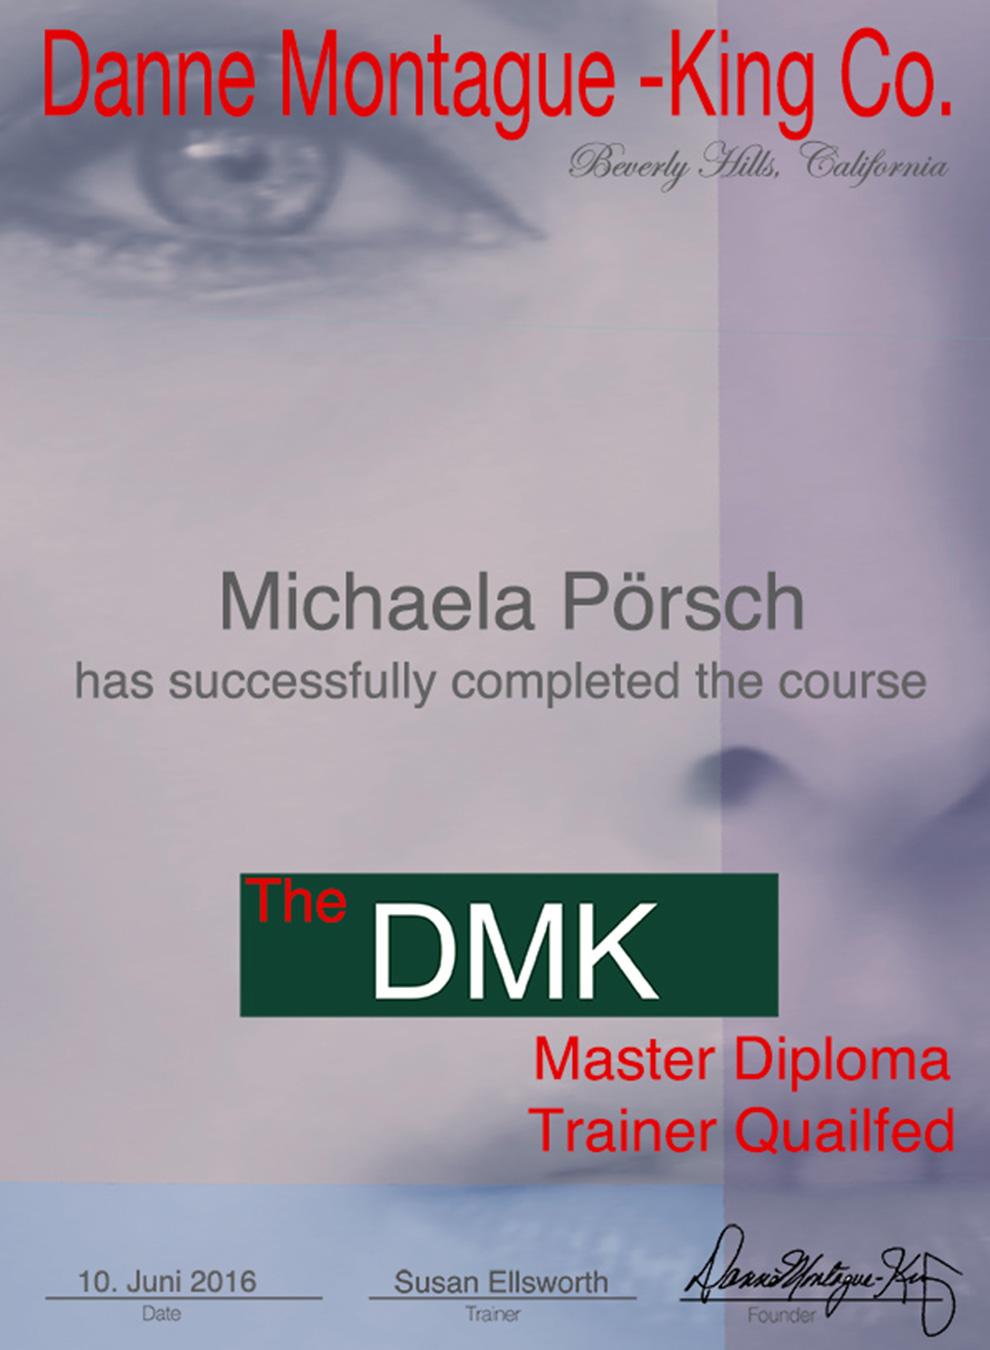 DMK Hautüberarbeitung Master Diploma